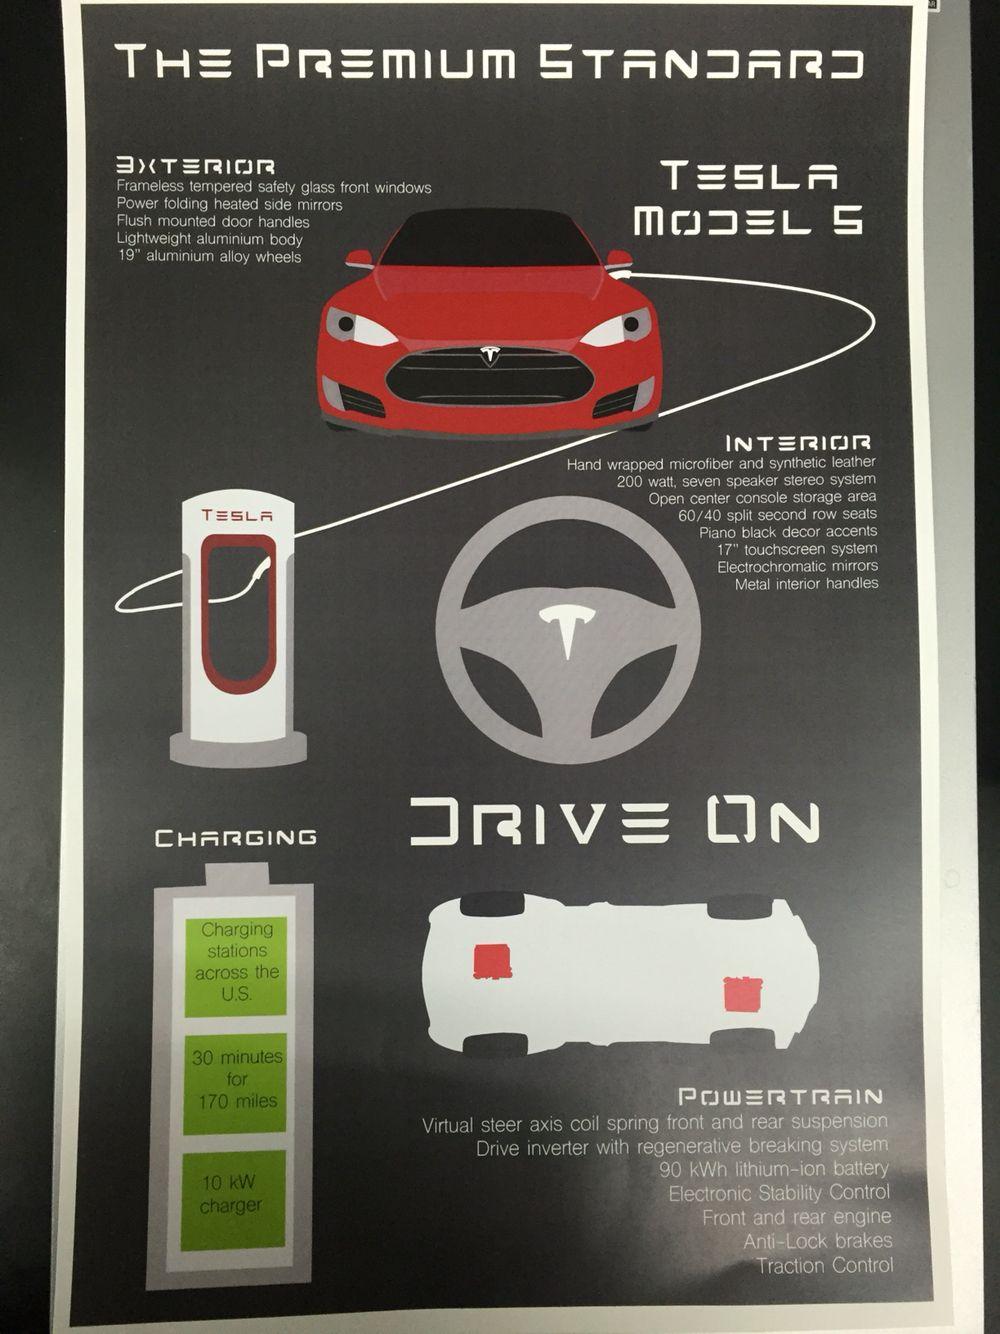 Tesla Infographic draft 2 (con immagini)